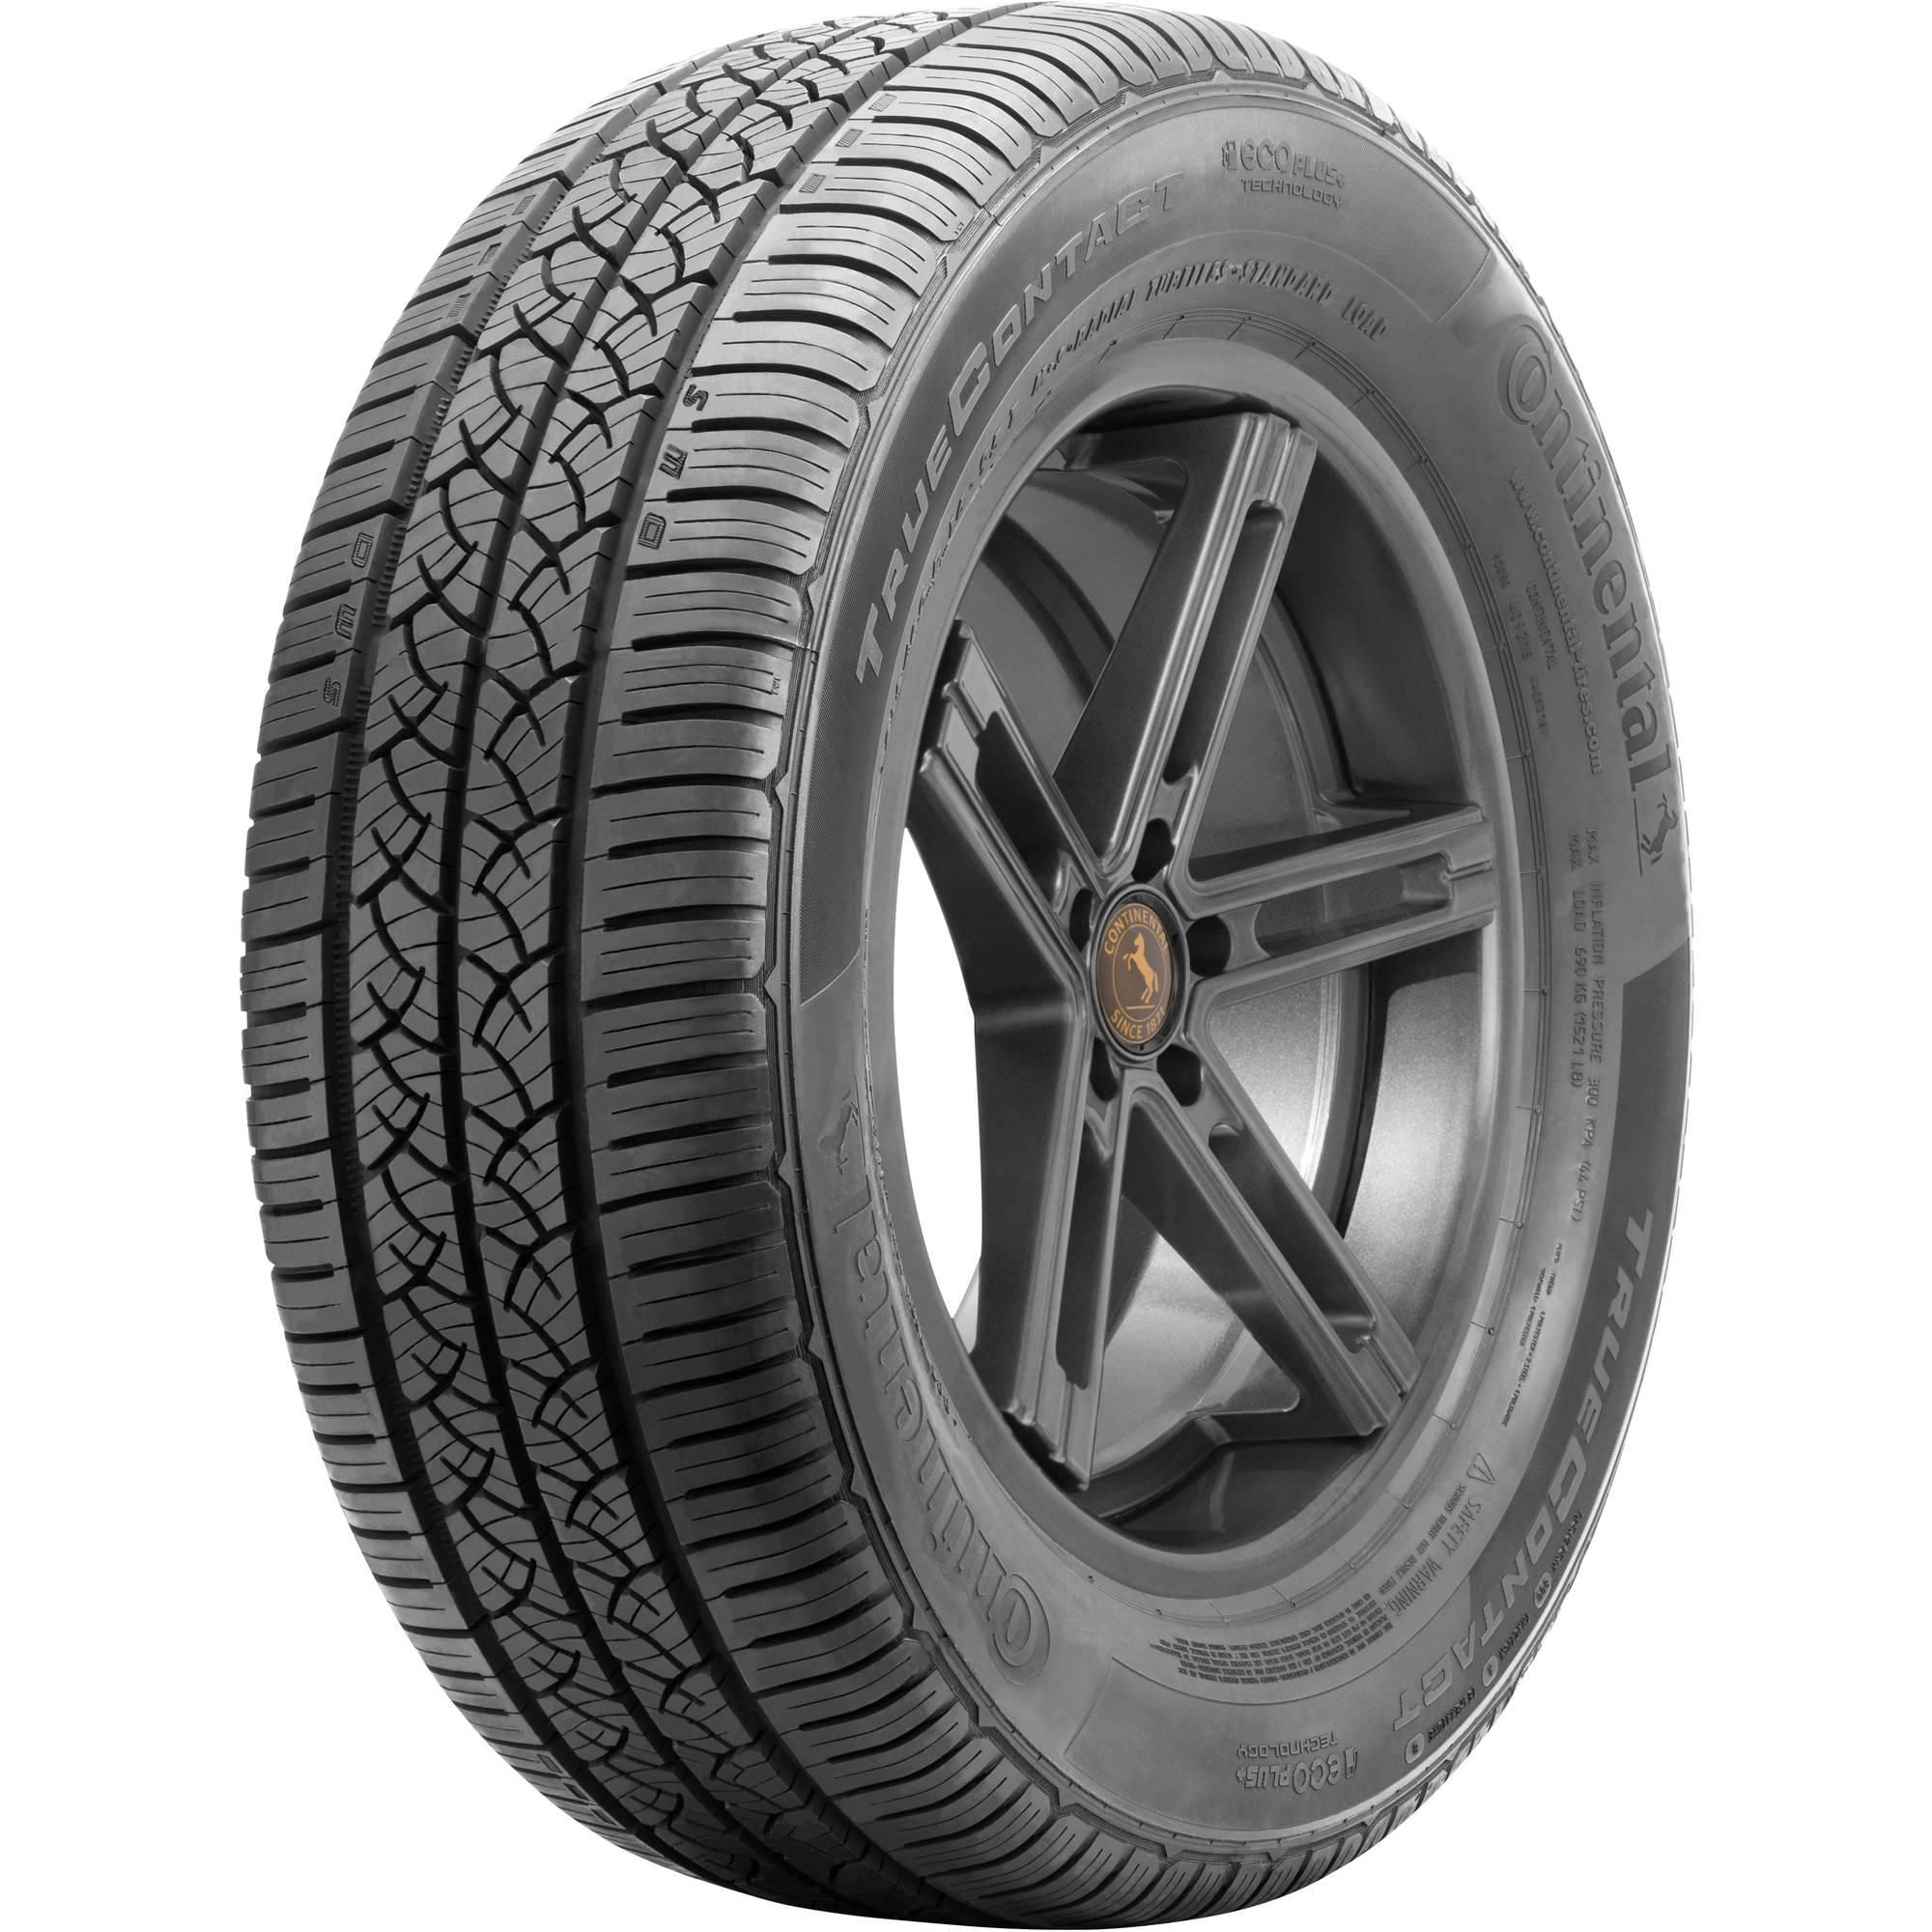 Continental Truecontact Tire 225/60R16 Tire 98H